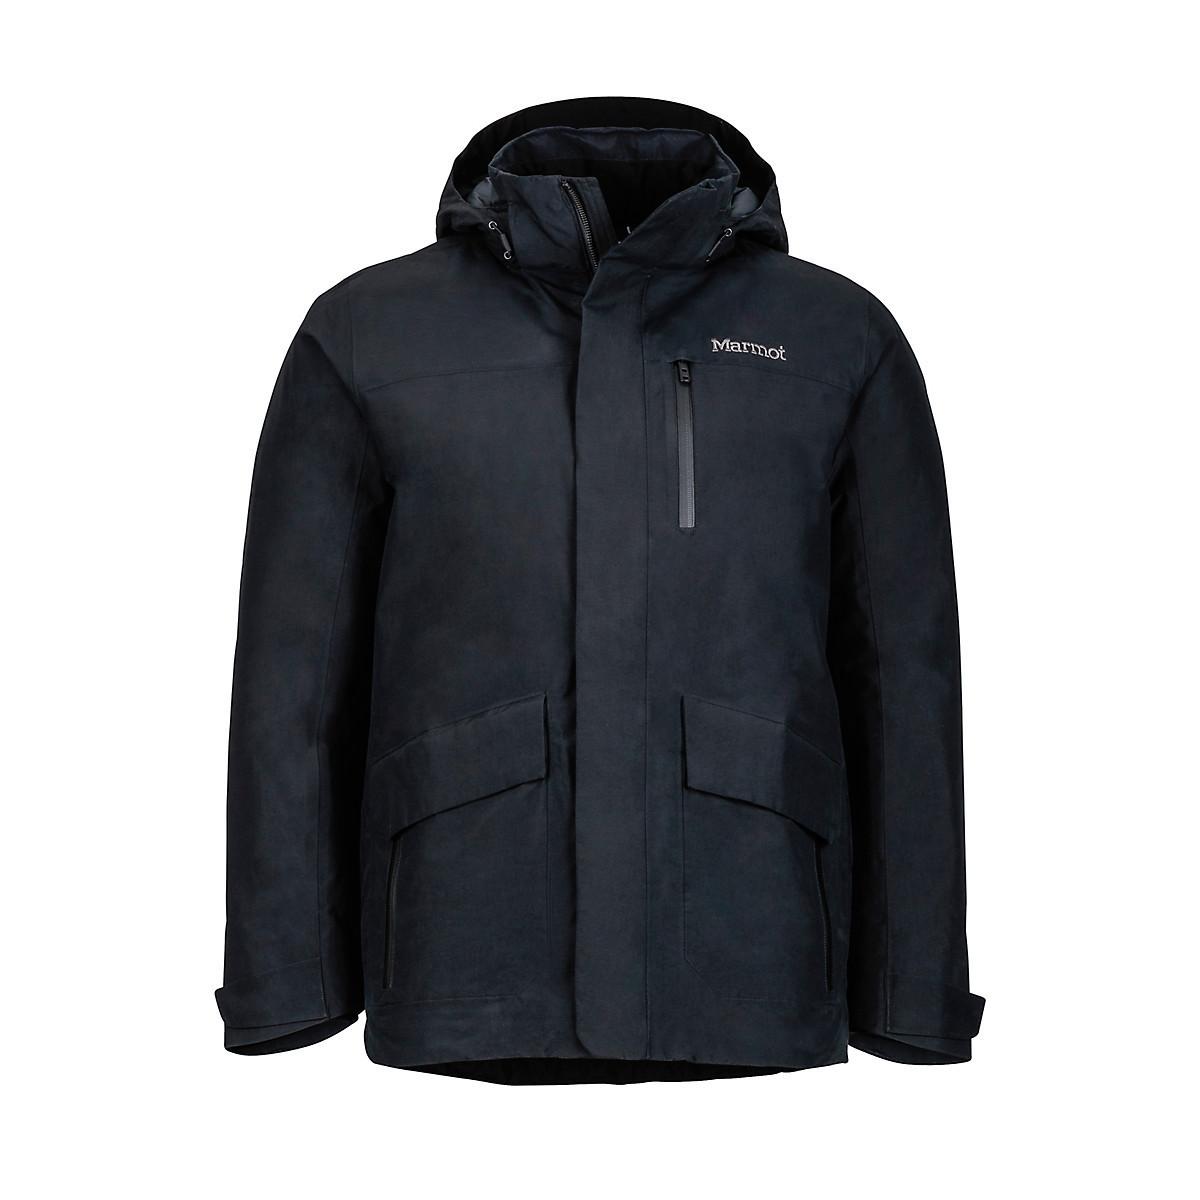 Marmot Men's Yorktown Featherless Jacket - Black, L